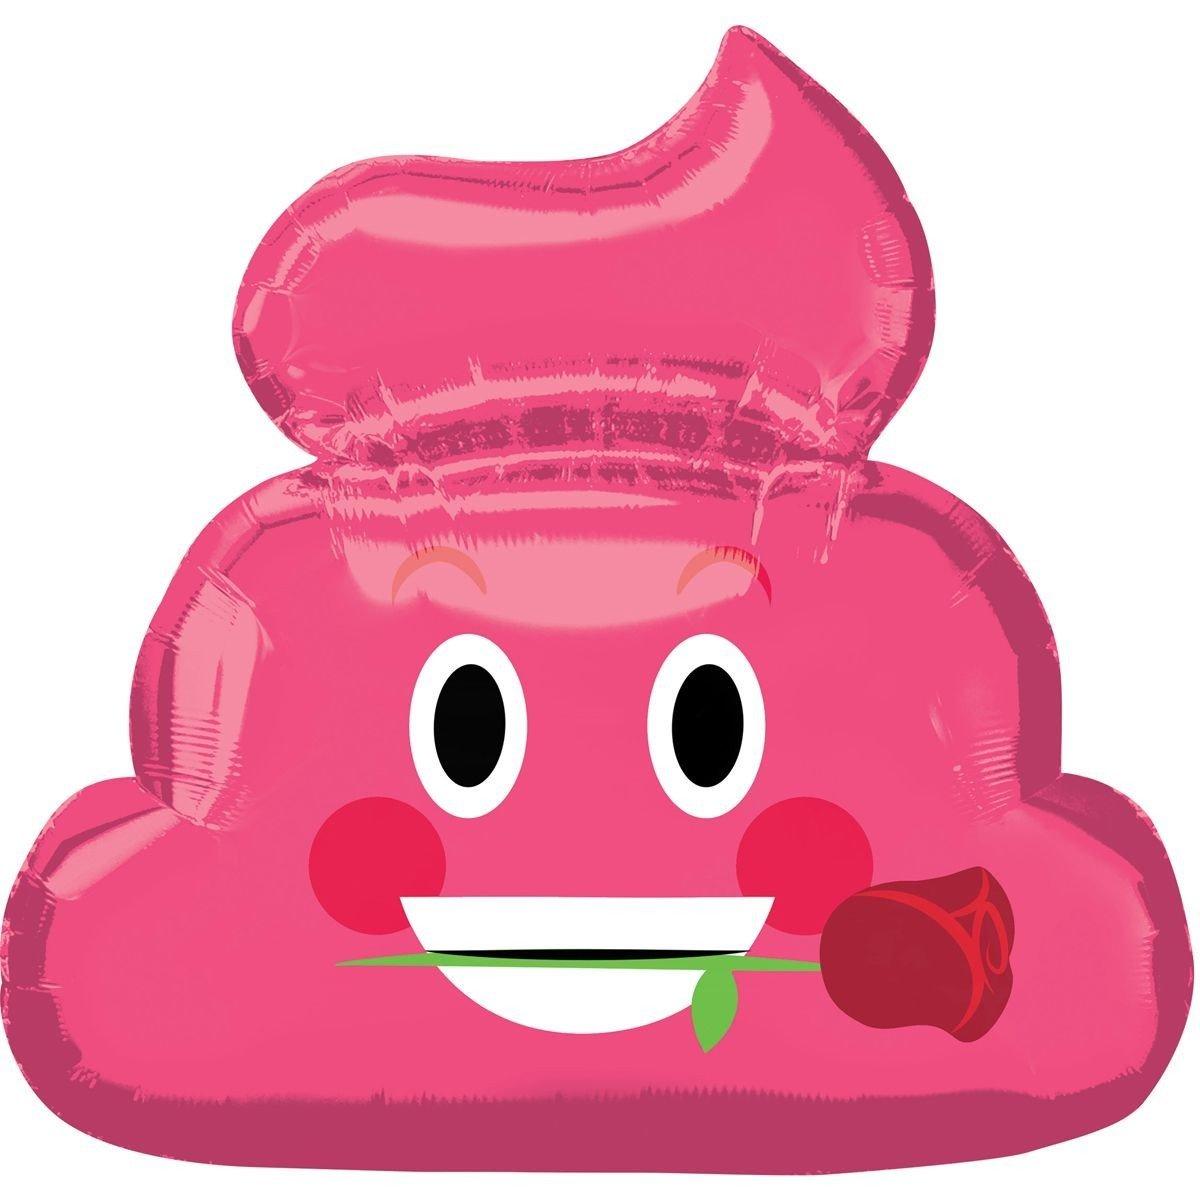 Шар фигура Смайл какашка розовая